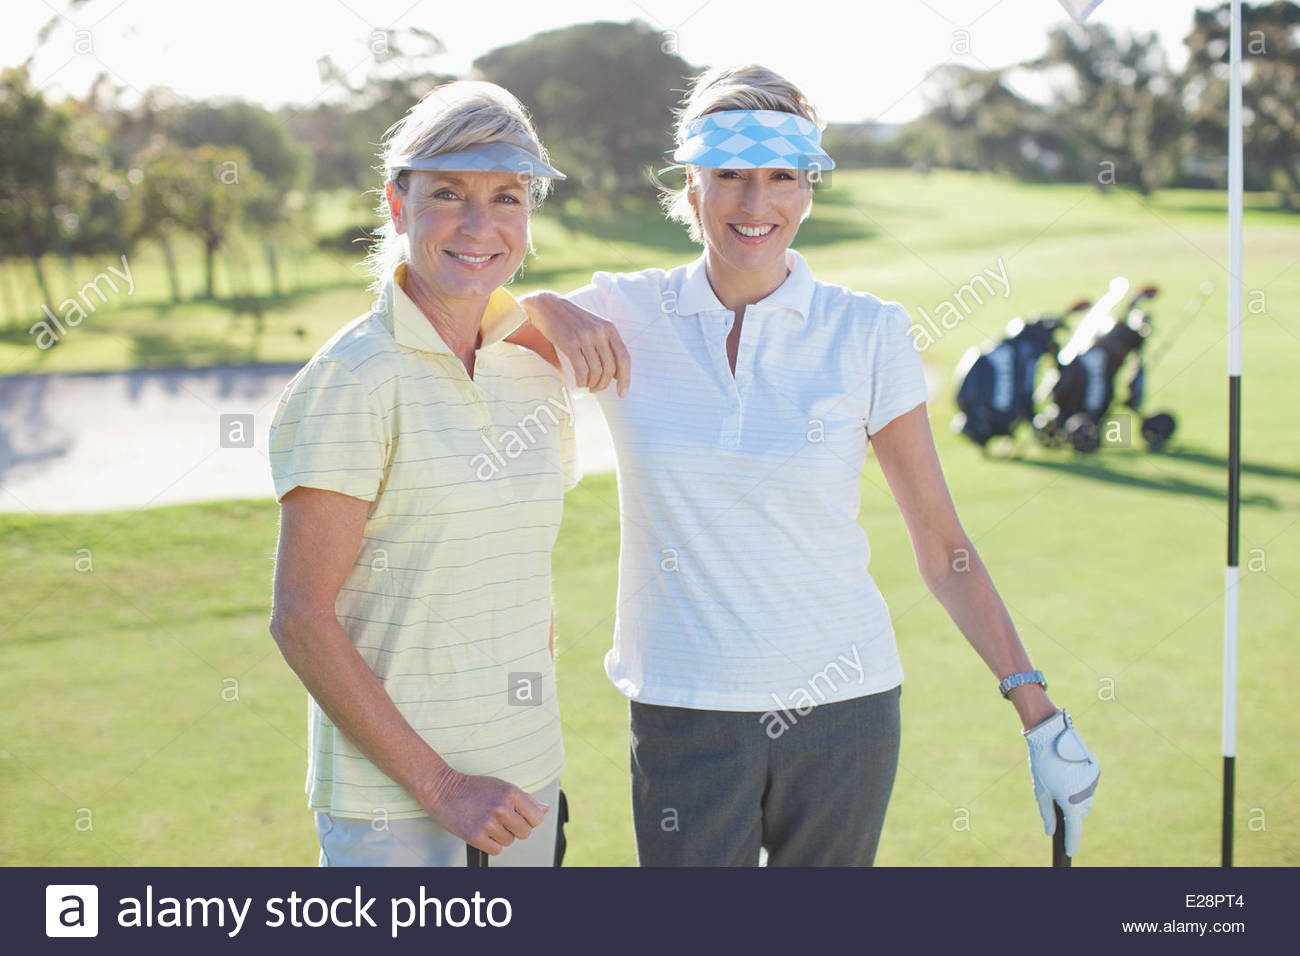 Freunde posieren auf Golfplatz Stockbild